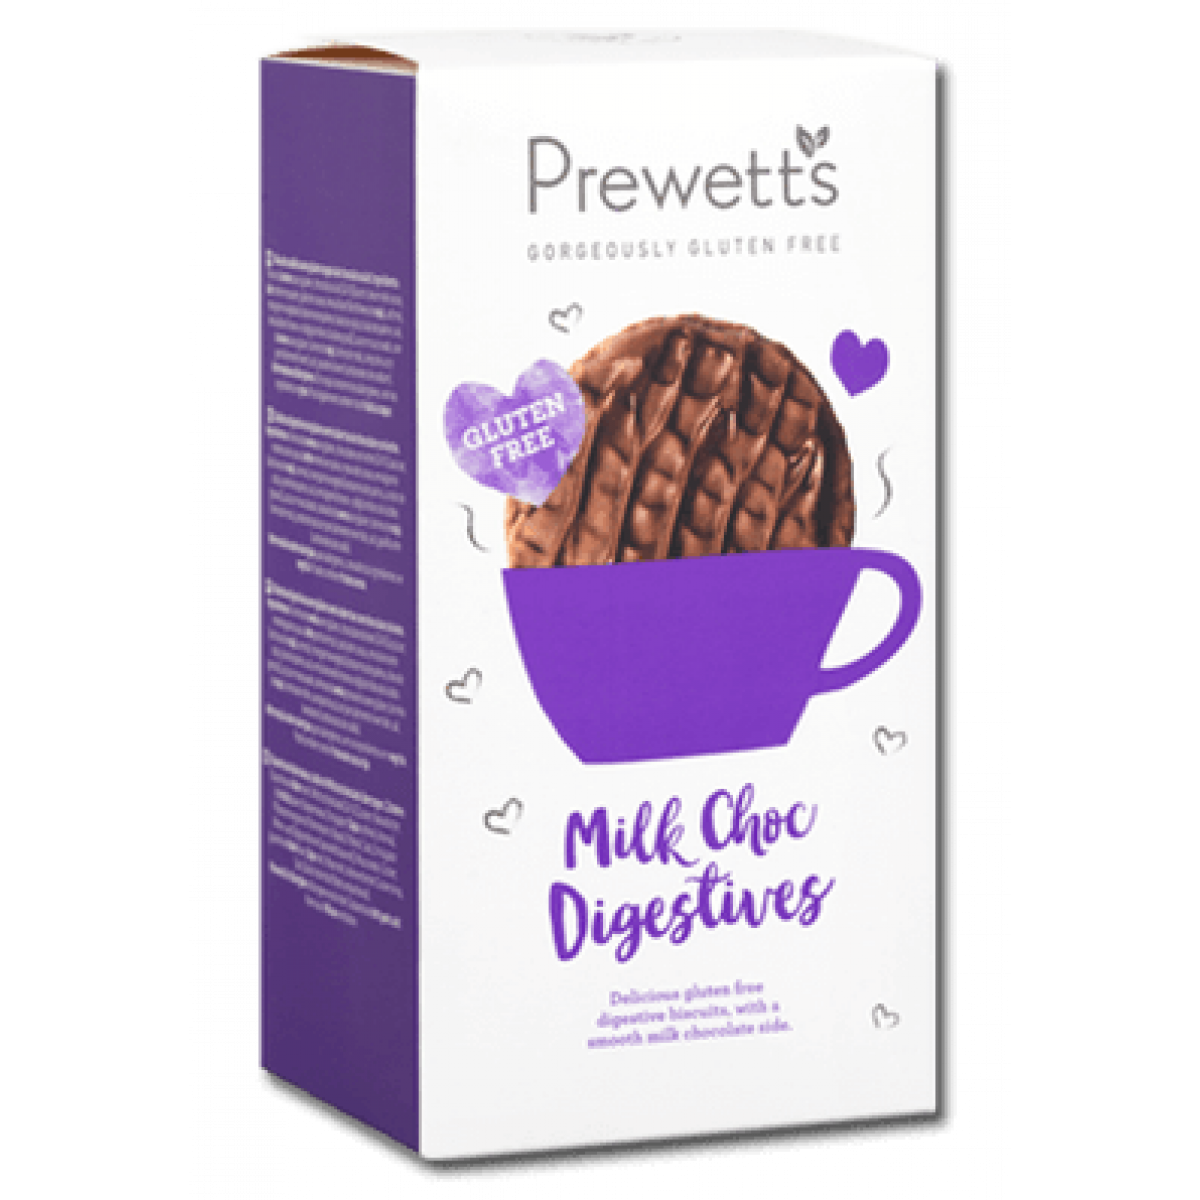 Milk Choc Digestives